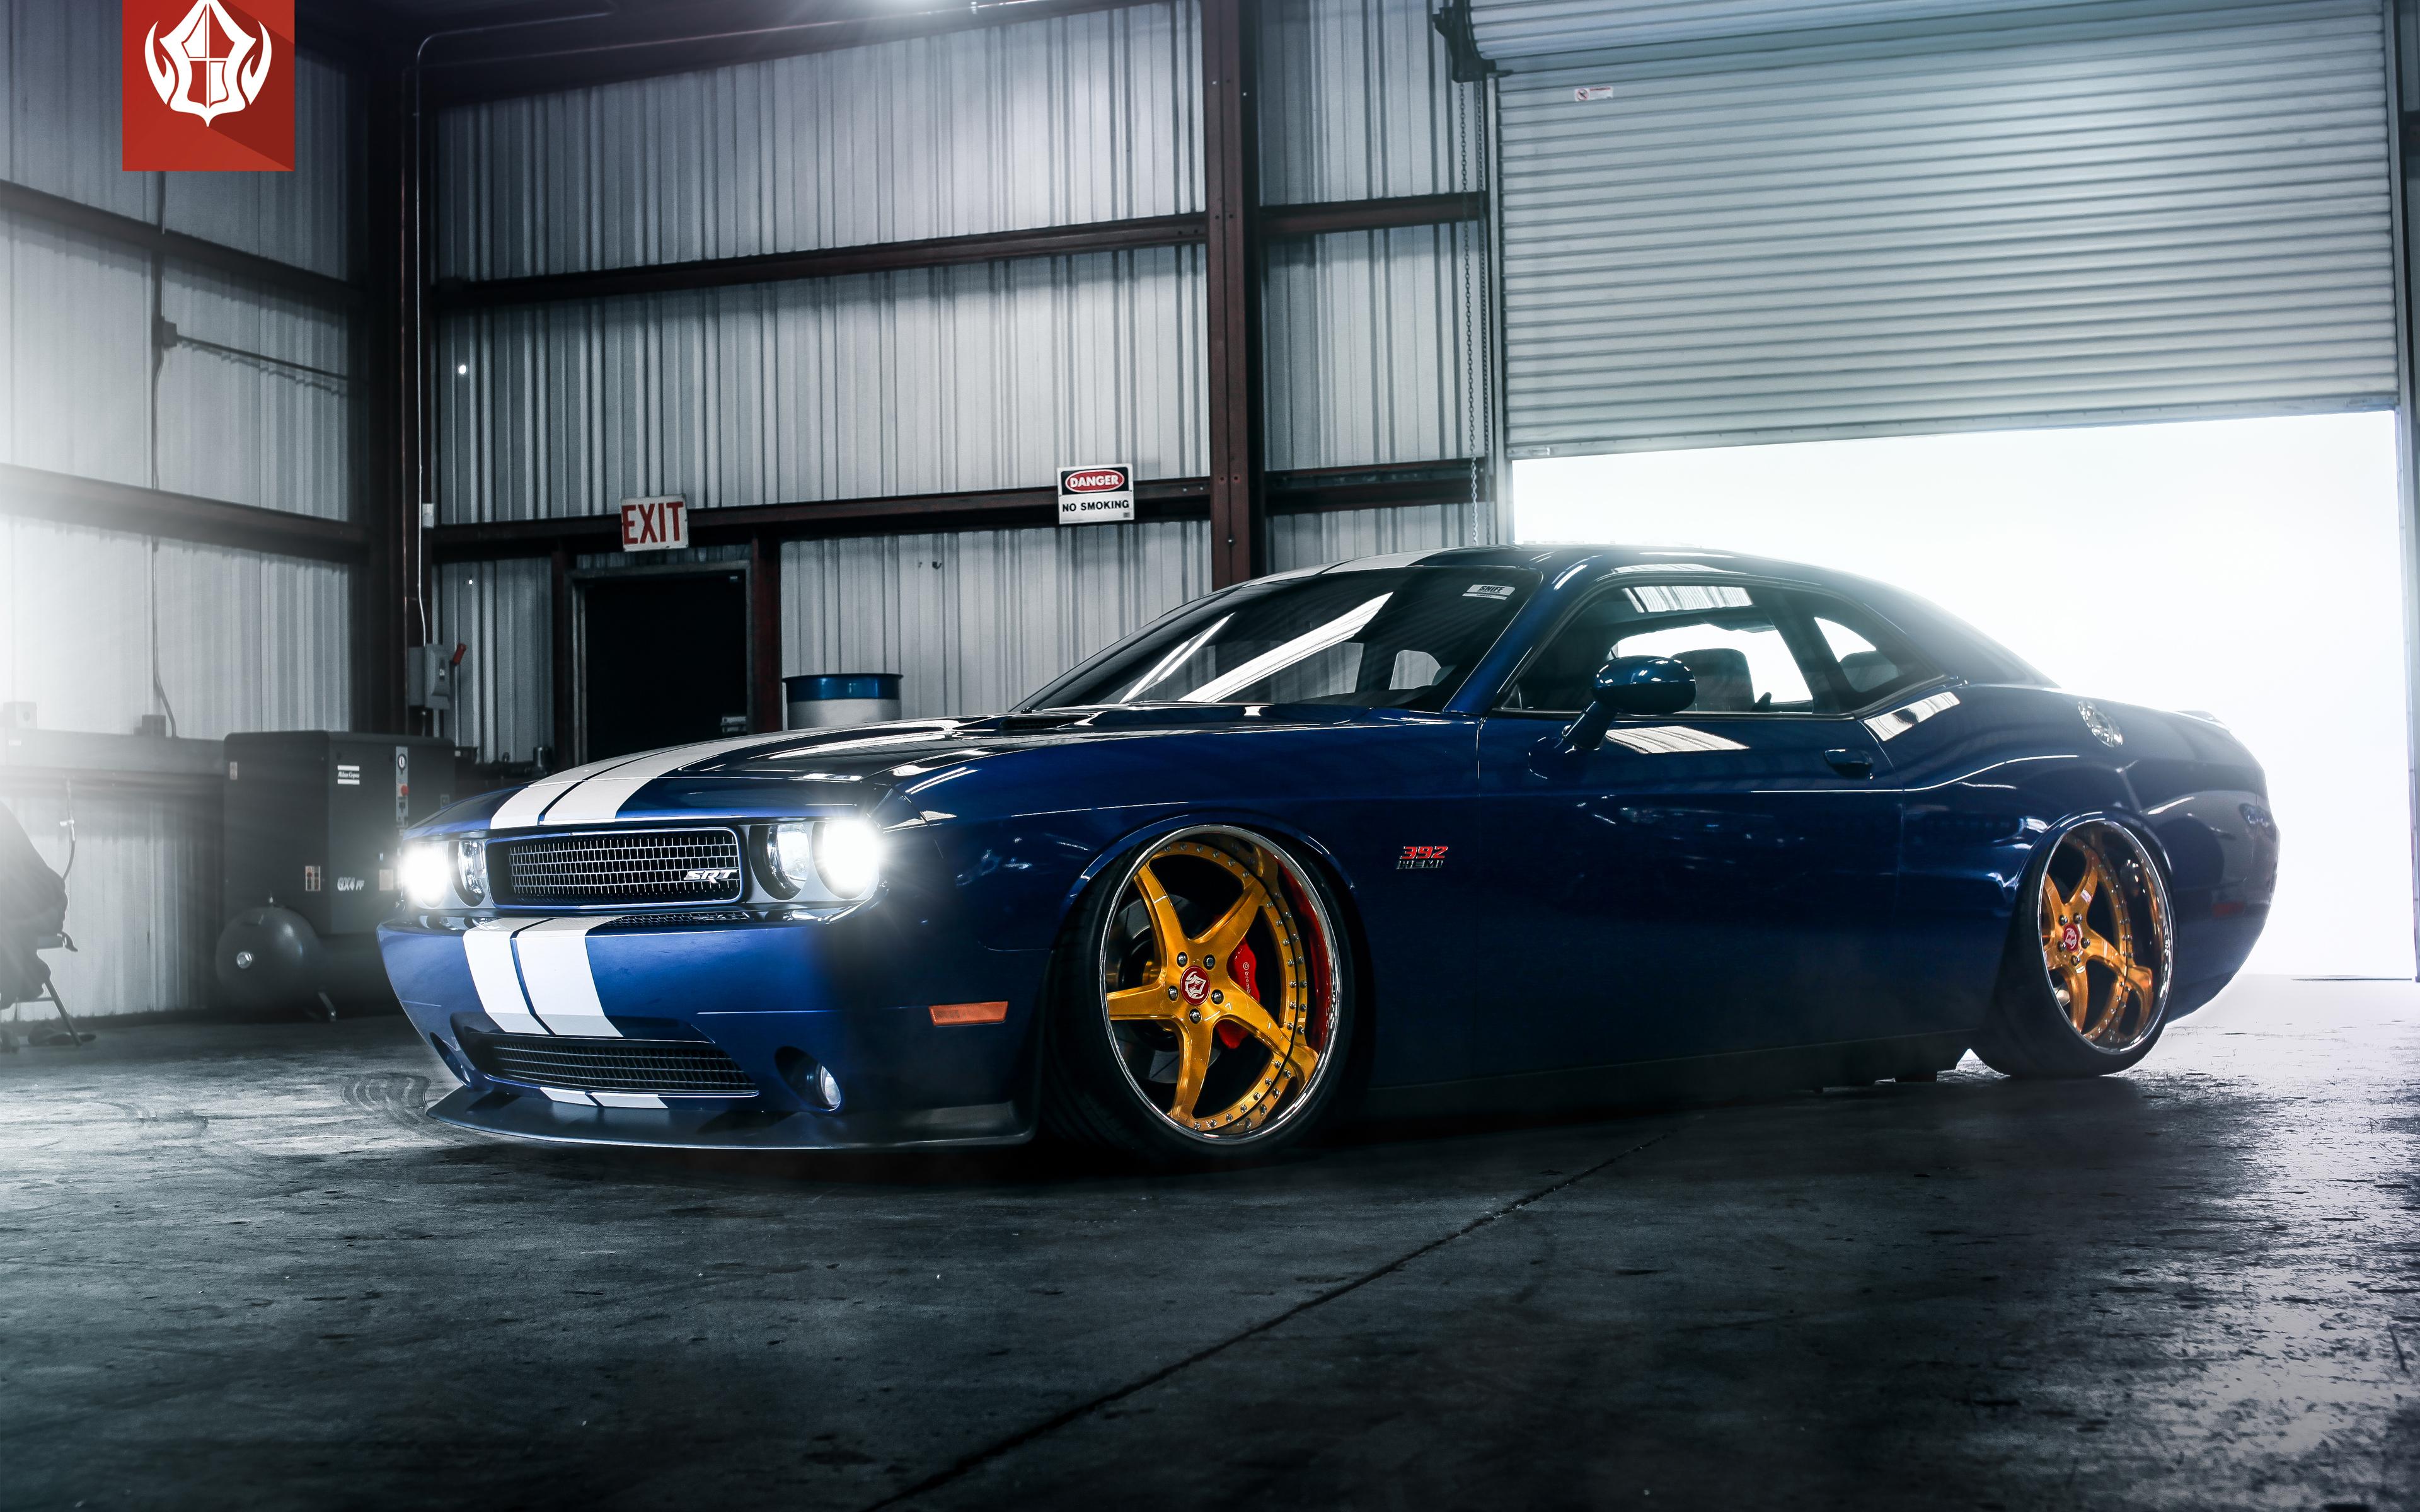 Dodge Challenger Srt 392 4k Wallpapers Challenger With Gold Rims 3840x2400 Wallpaper Teahub Io